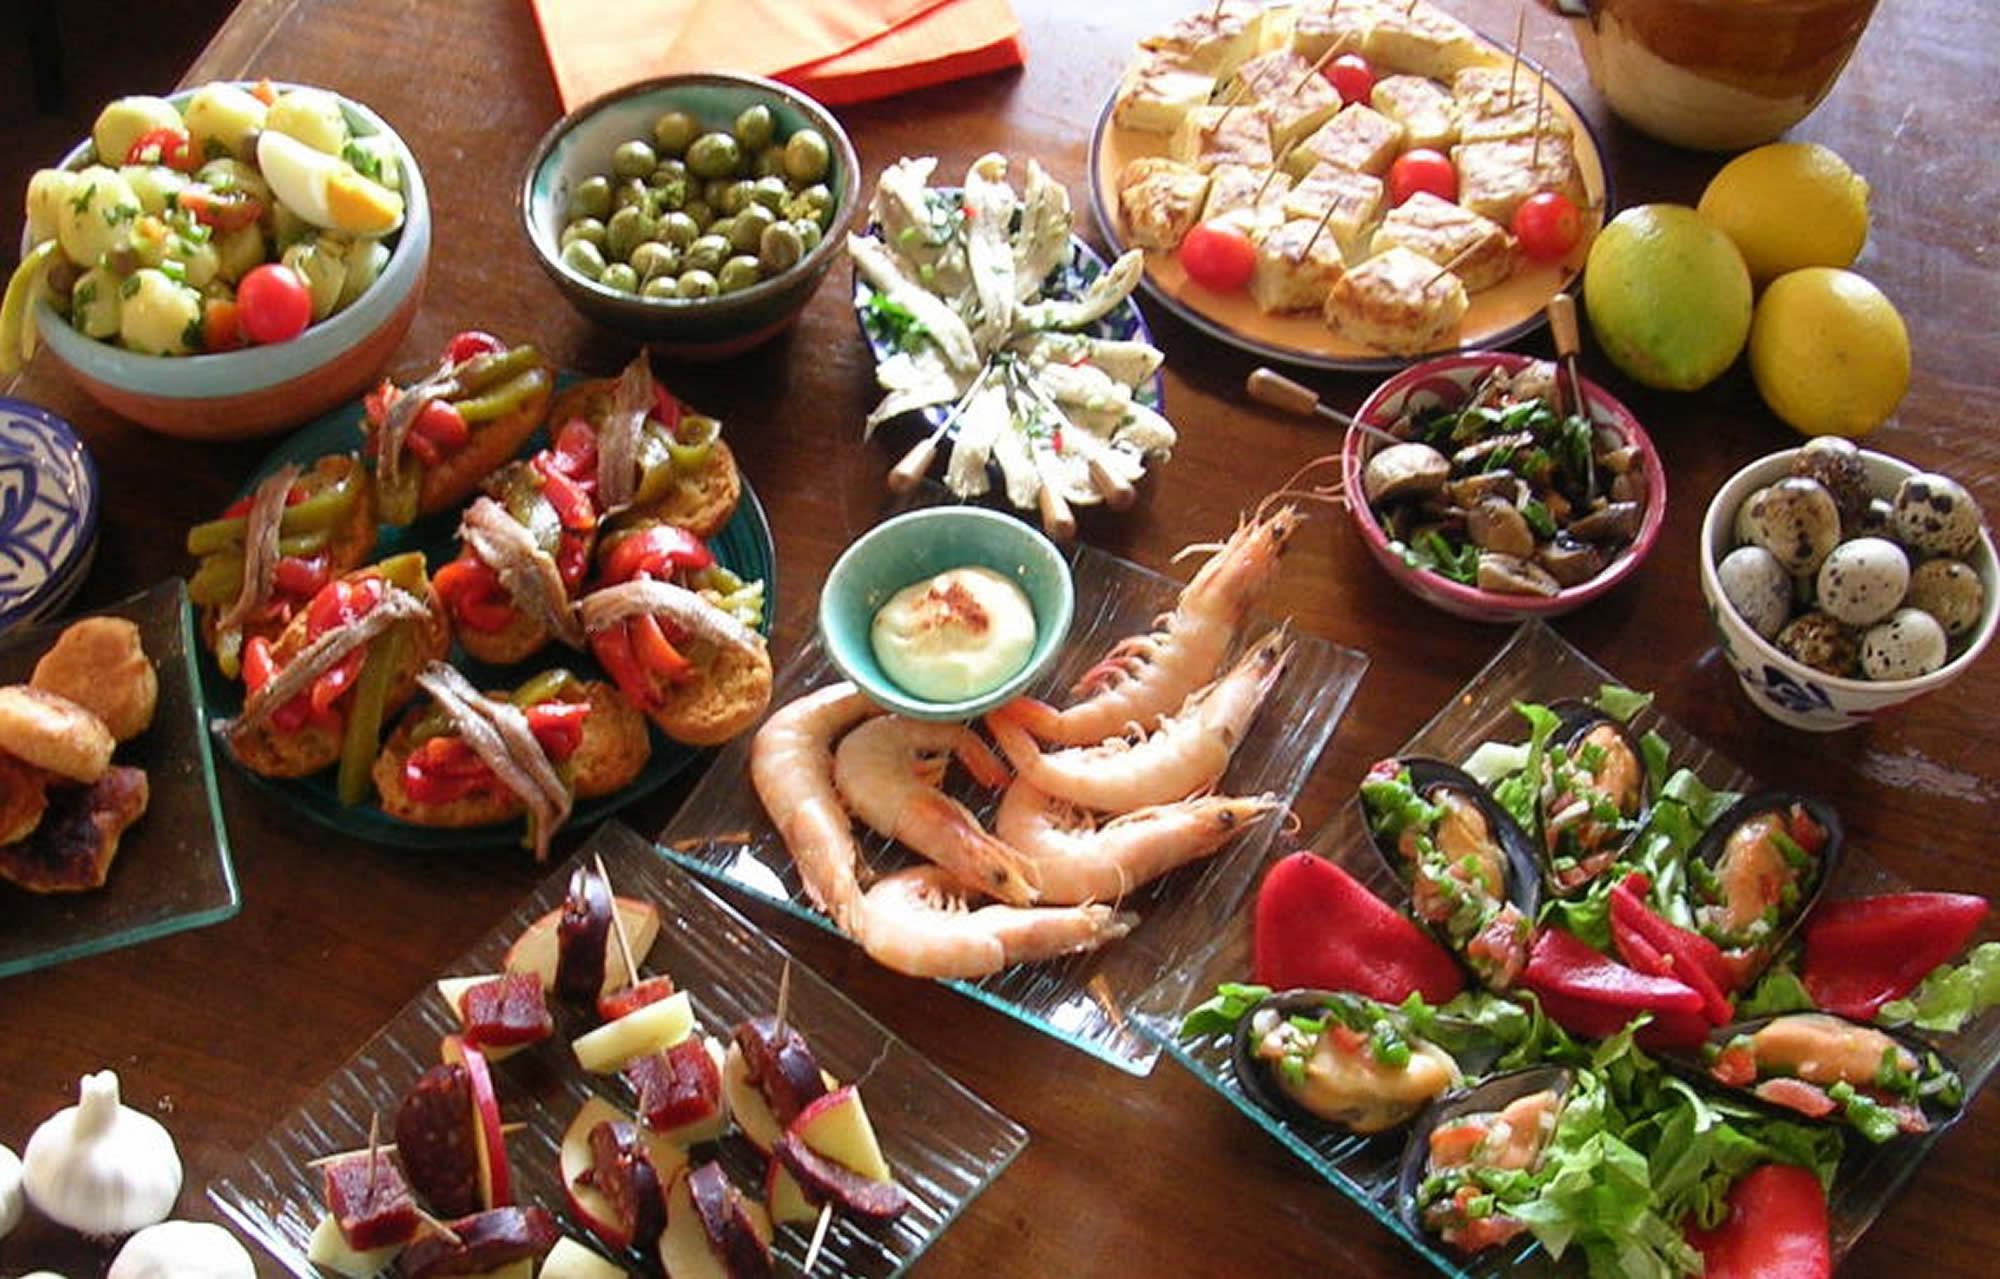 Tapeando: The Spanish Tapas Table